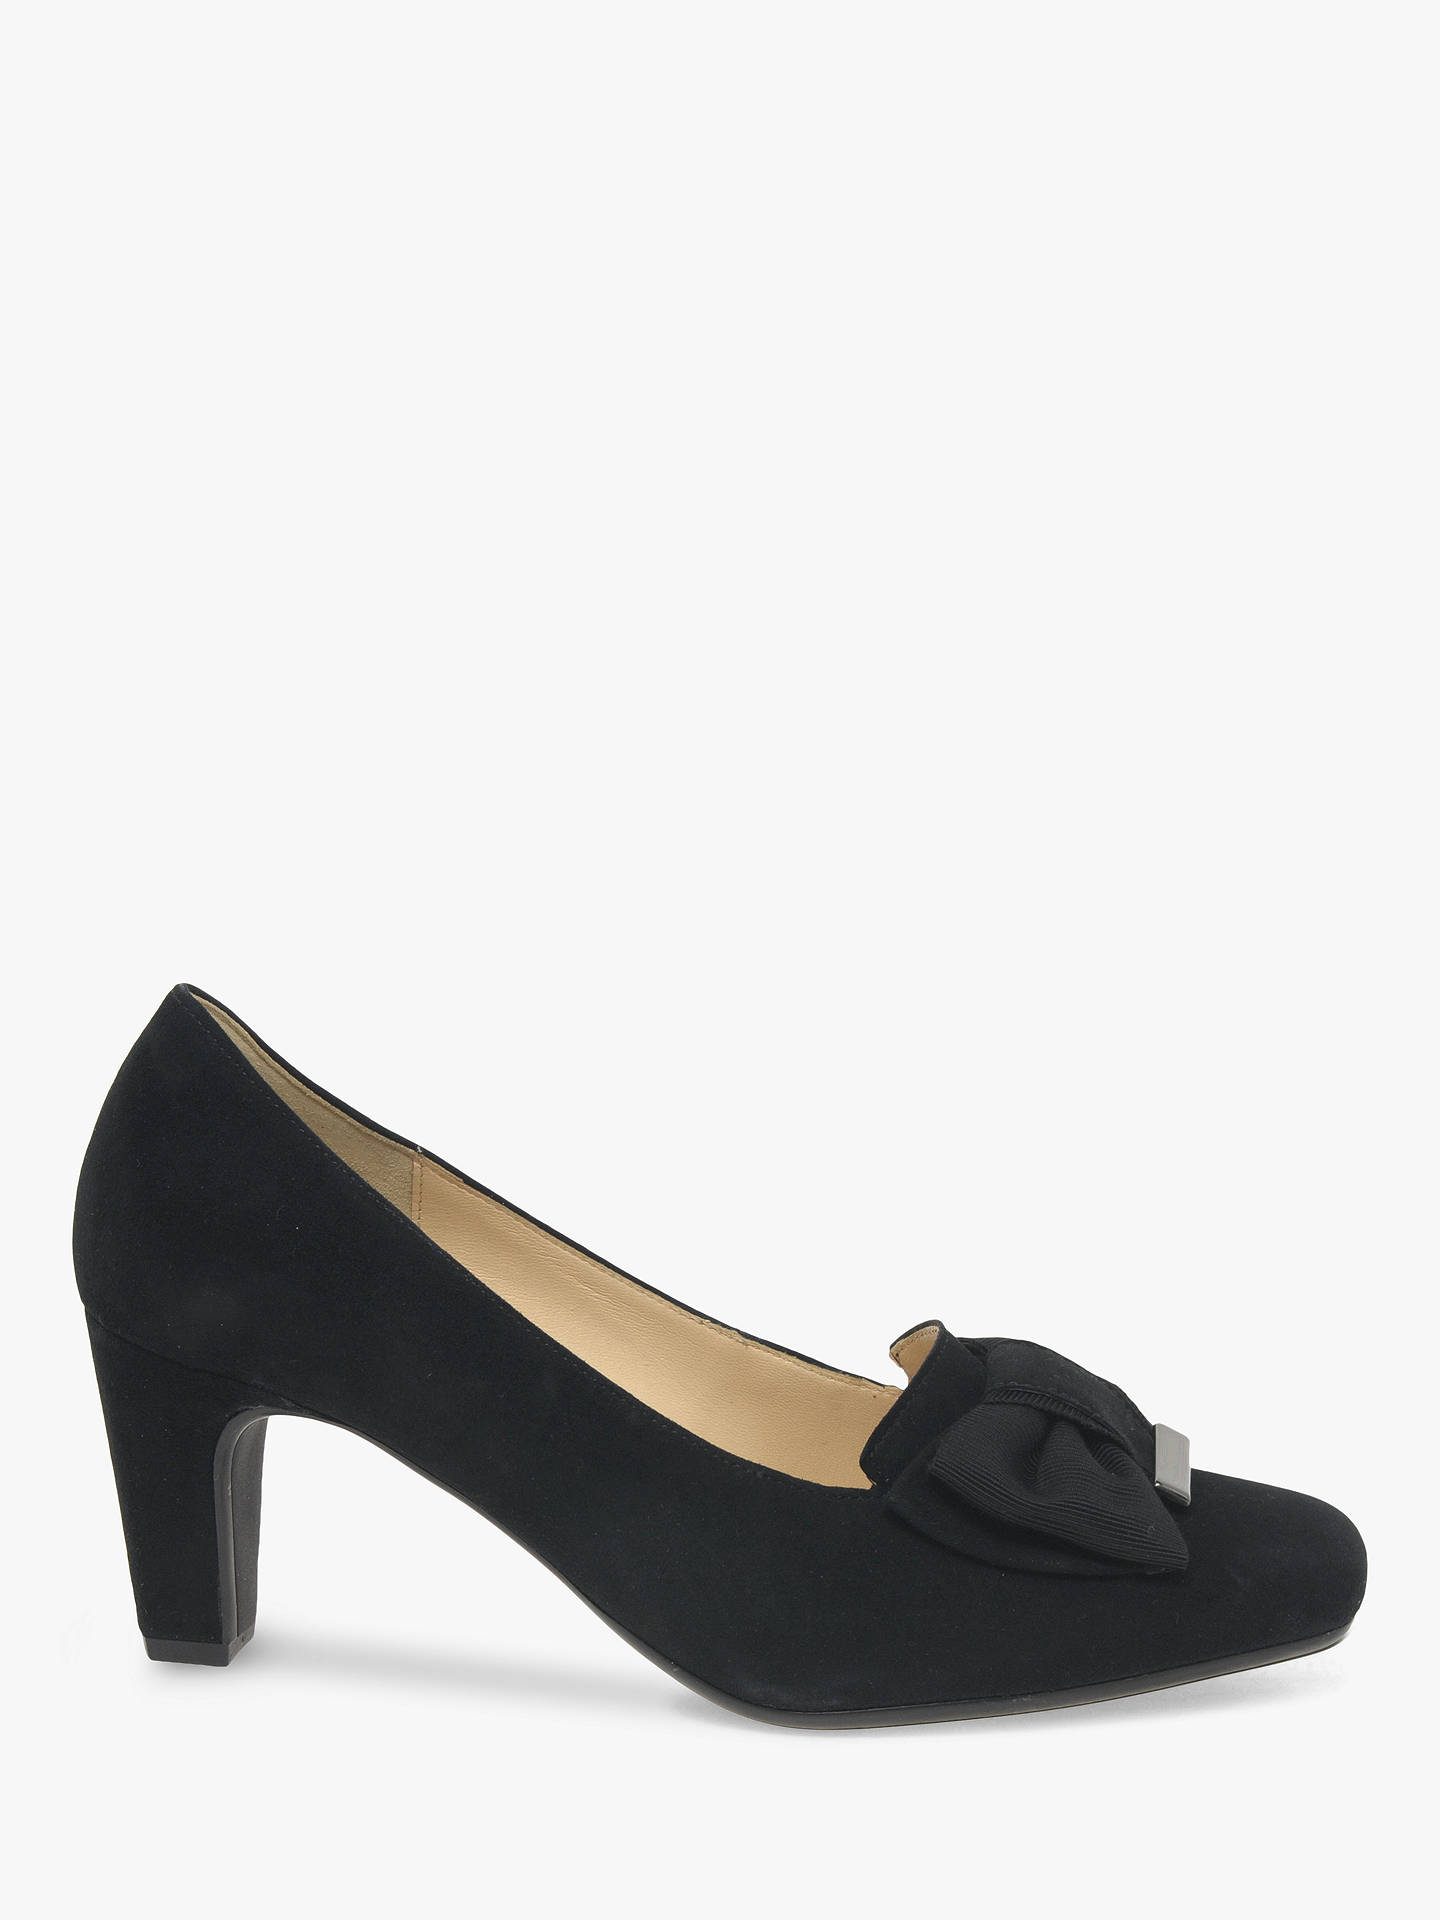 Gabor Vegas Suede Bow Front Court Shoes, Black at John Lewis